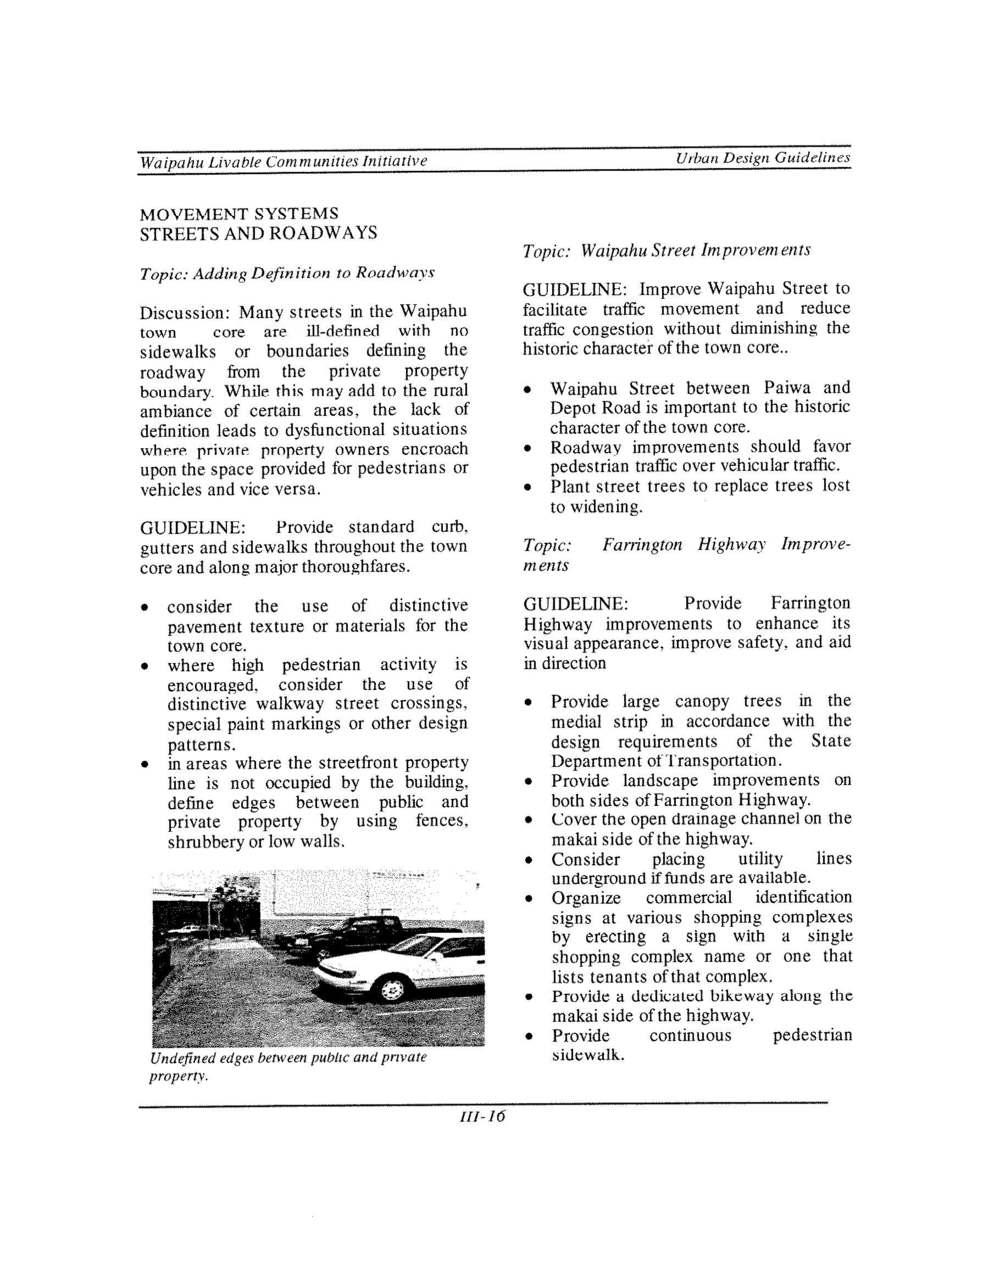 160531_WaipahuLivableCommunities(1998)_Page_106.jpg